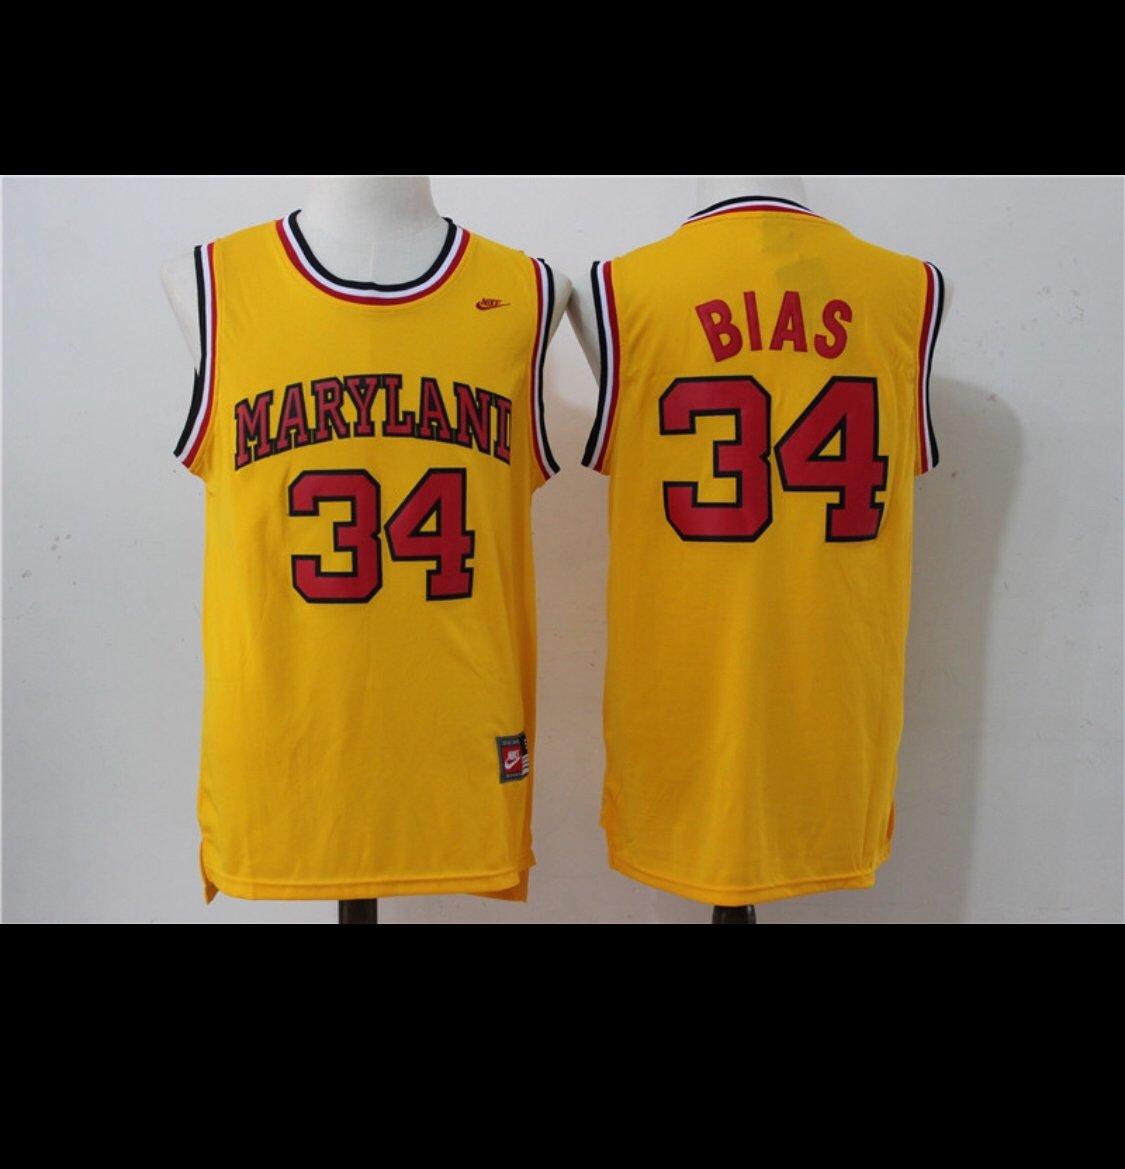 Len bias Maryland jersey